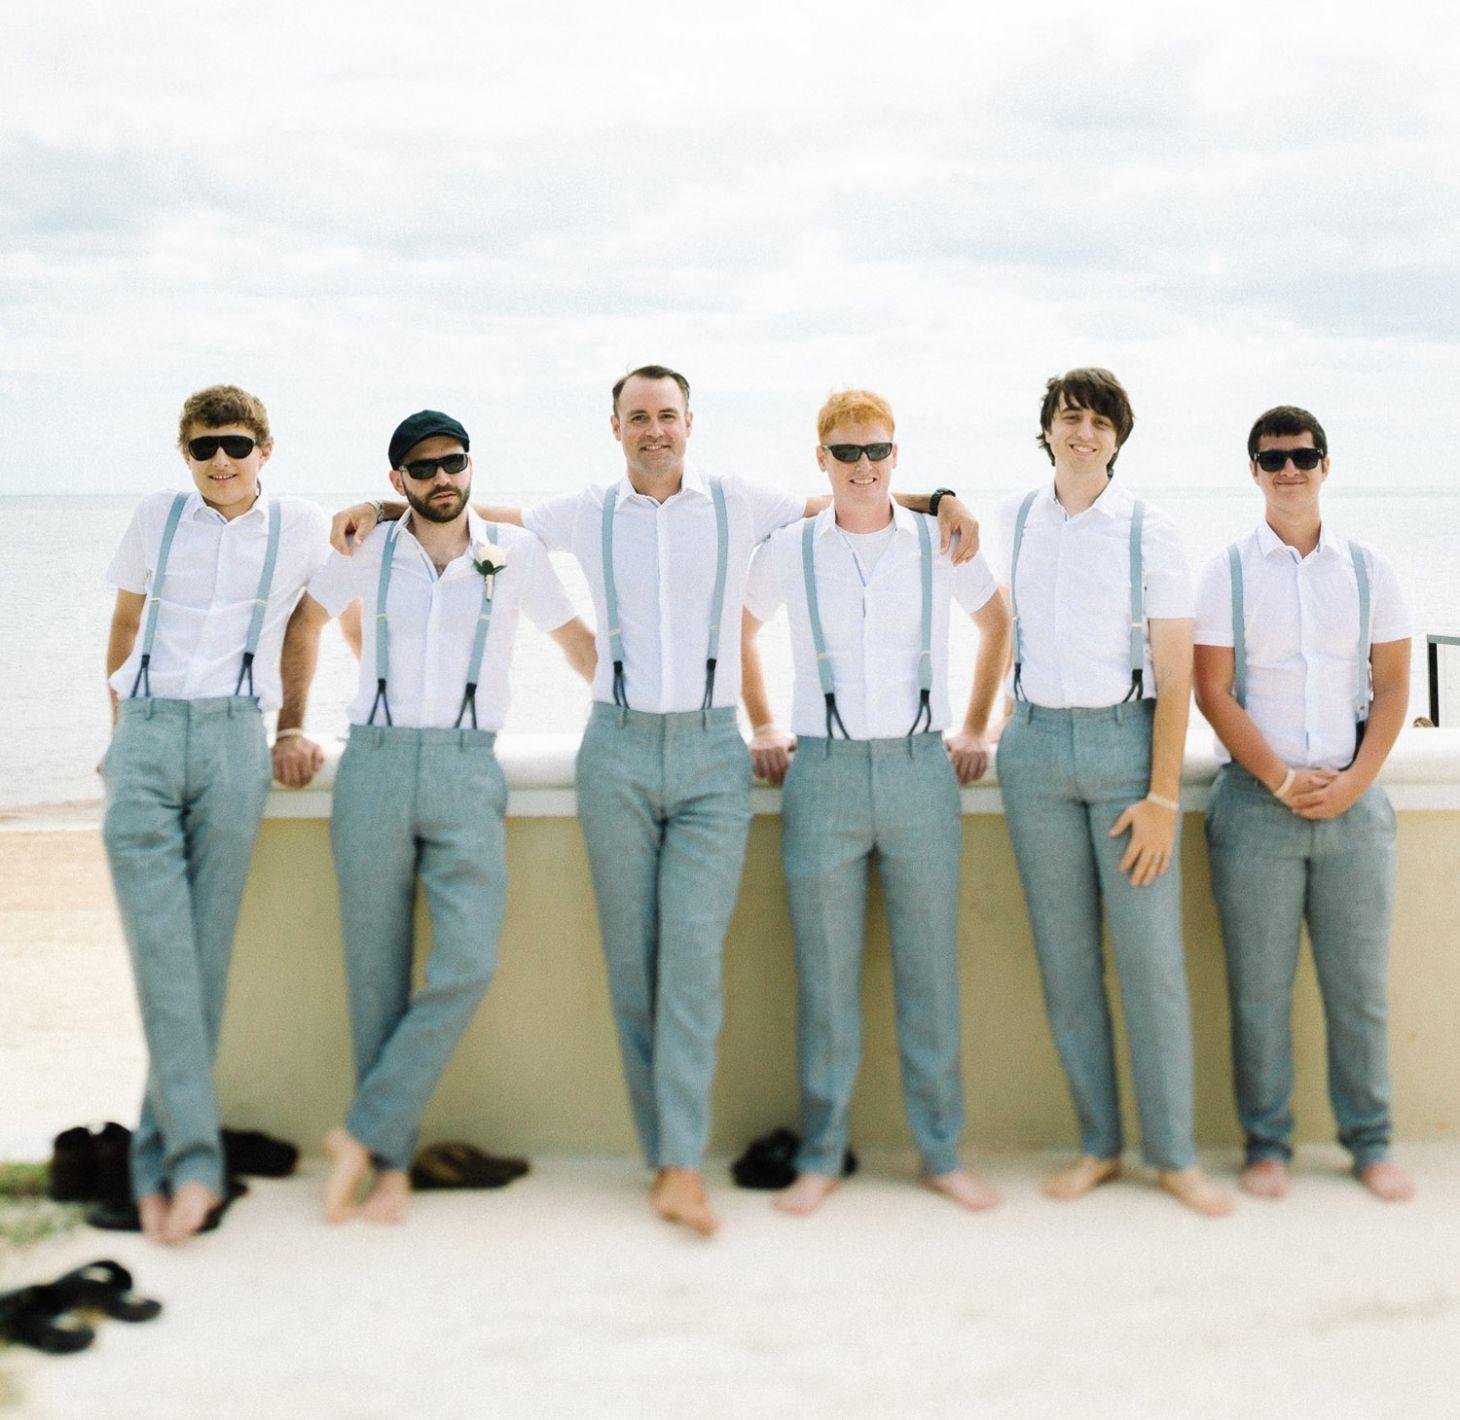 Beach Wedding Outfit Ideas: Groomsmen At A Beach Wedding With Grey Slacks And Light